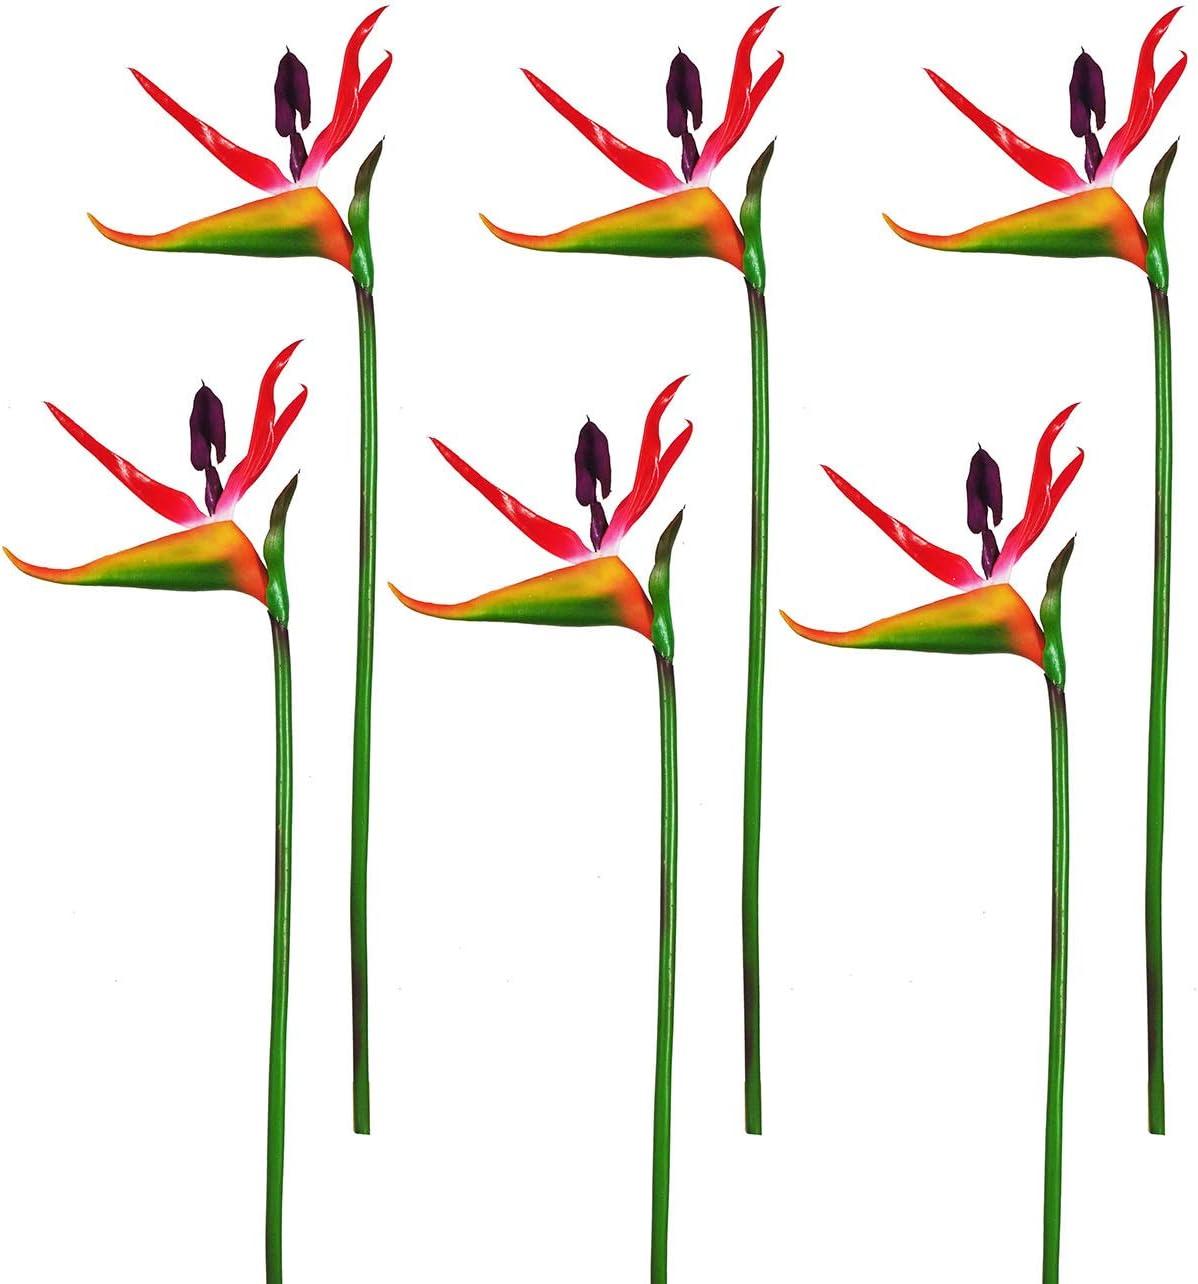 Artificial Flowers Bird of Paradise Greenery Plants Indoor Outside Garland Home Garden Office Verandah Wedding Decorations 6pcs (Red, 6 Pack)